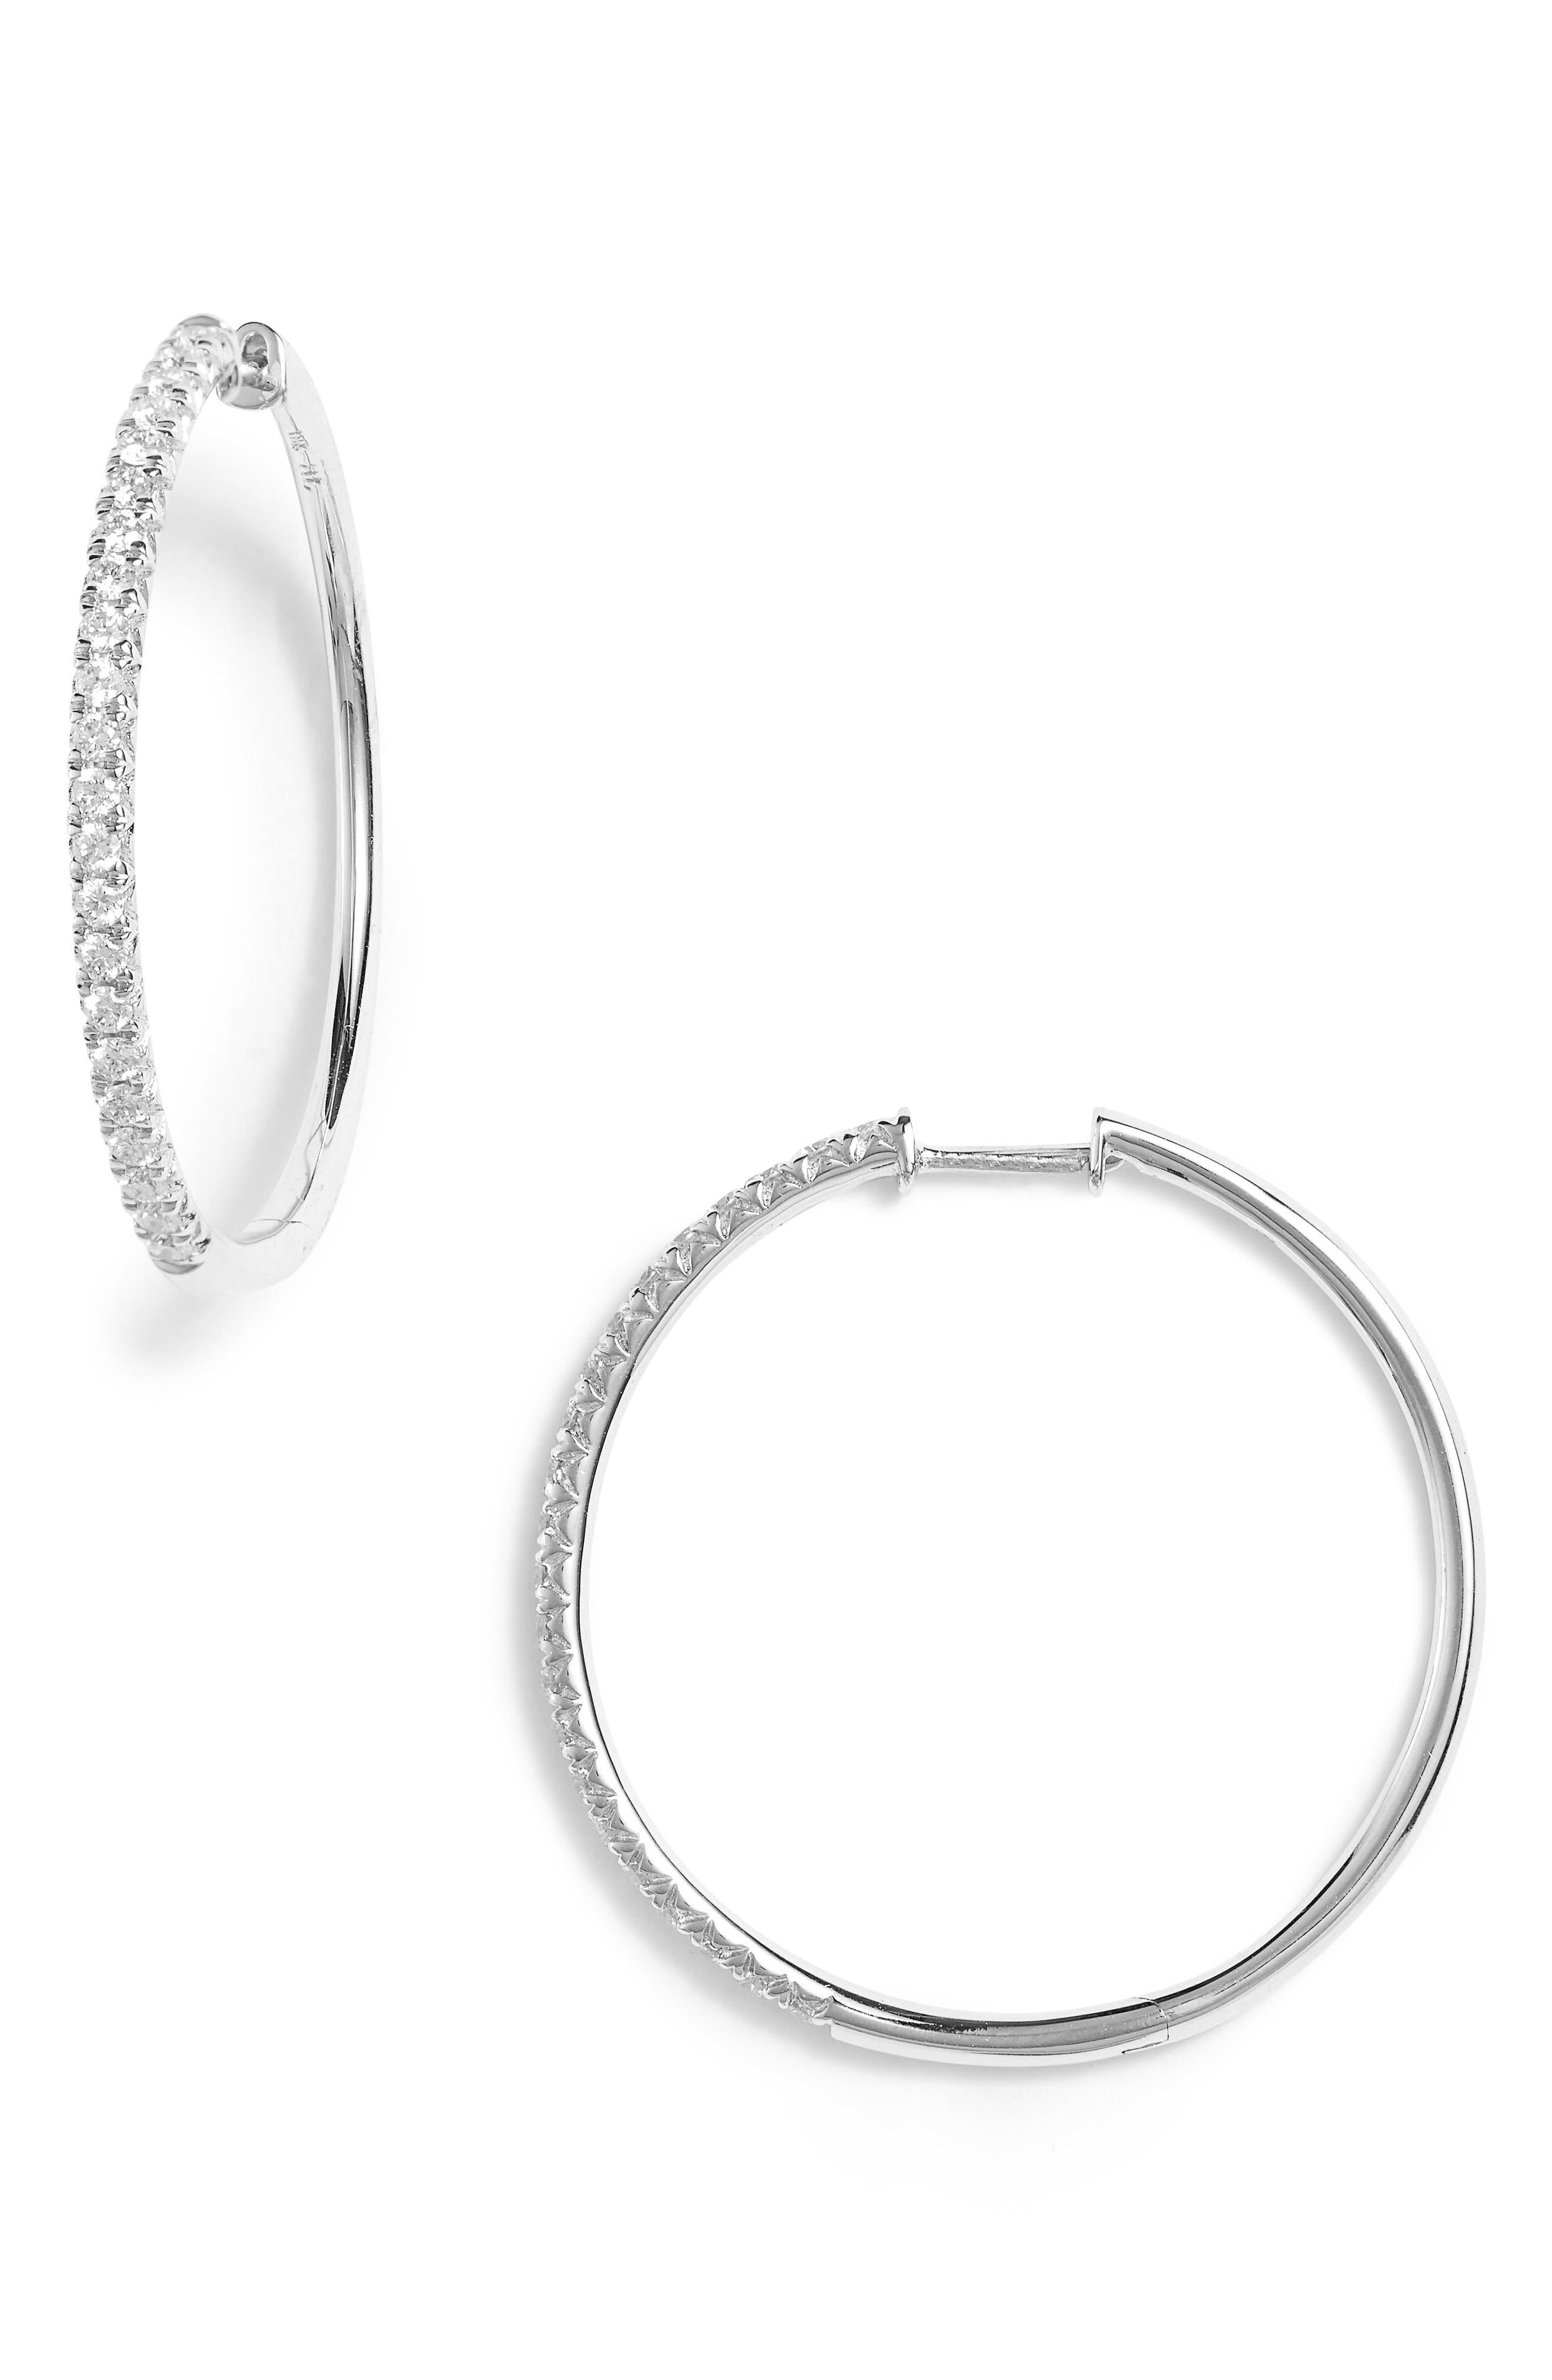 Main Image - Bony Levy Kiera French Cut Diamond Hoop Earrings (Nordstrom Exclusive)